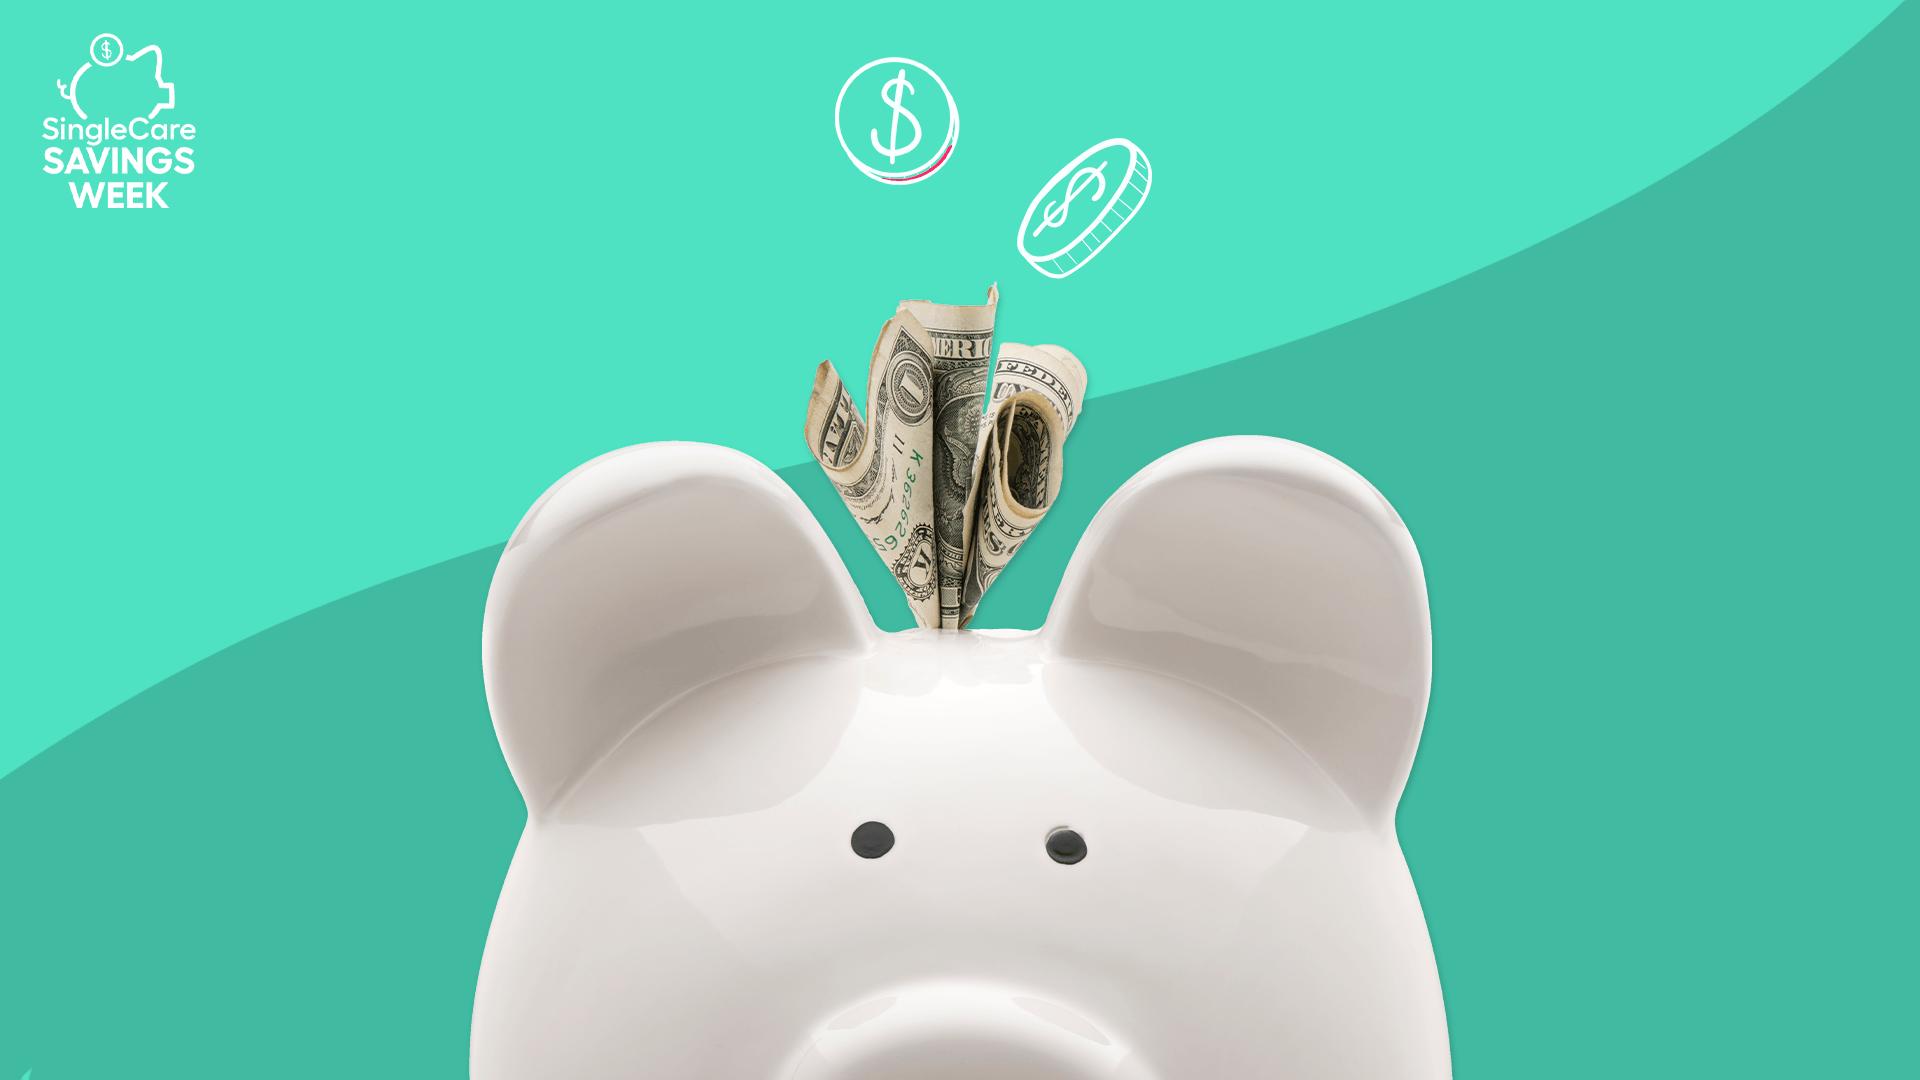 The 10 best SingleCare savings today